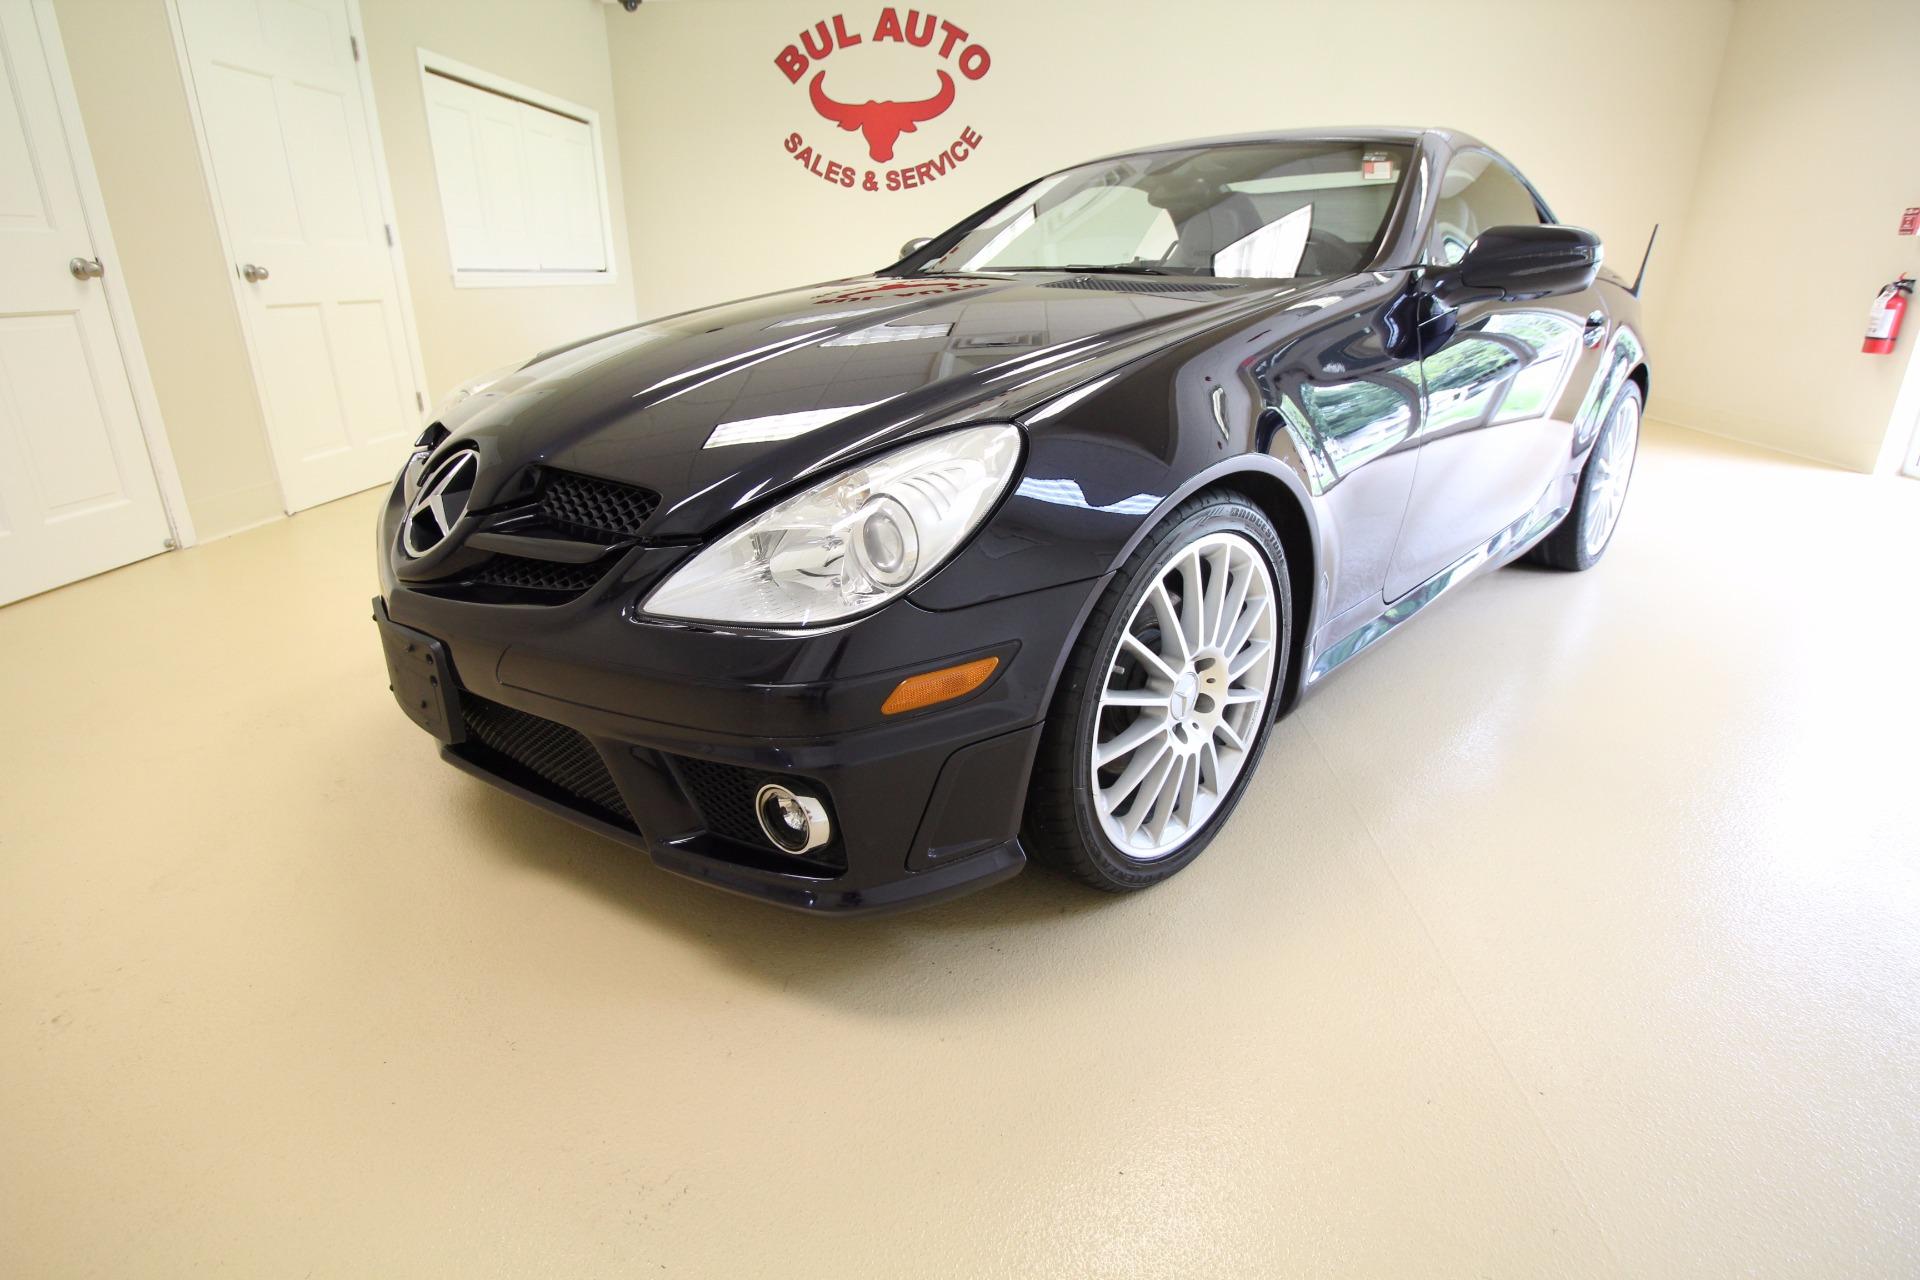 2009 mercedes benz slk slk300 stock 17235 for sale near for Mercedes benz albany ny